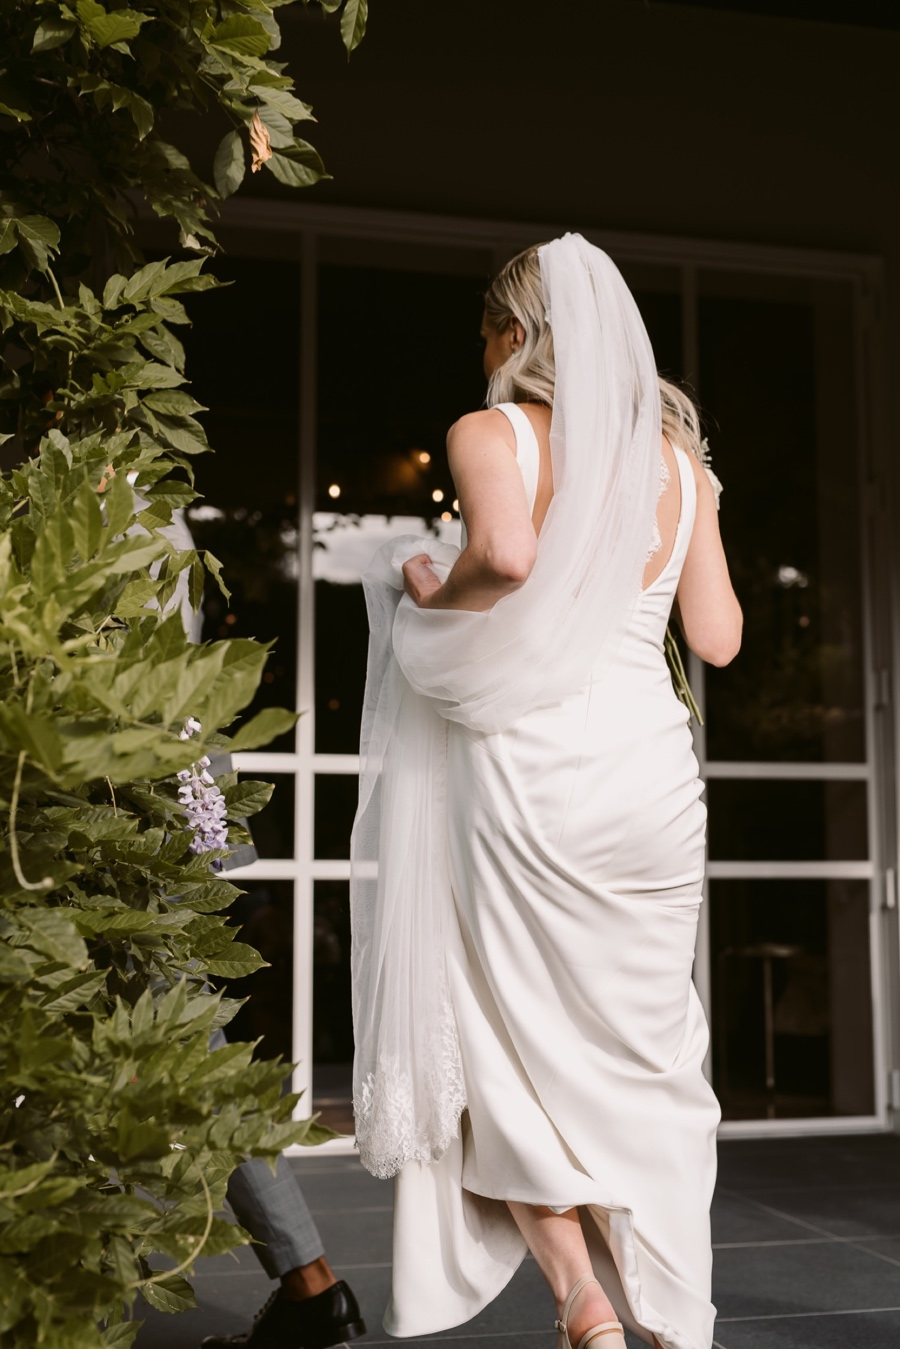 Quat Quatta Melbourne Wedding Photography67.jpg